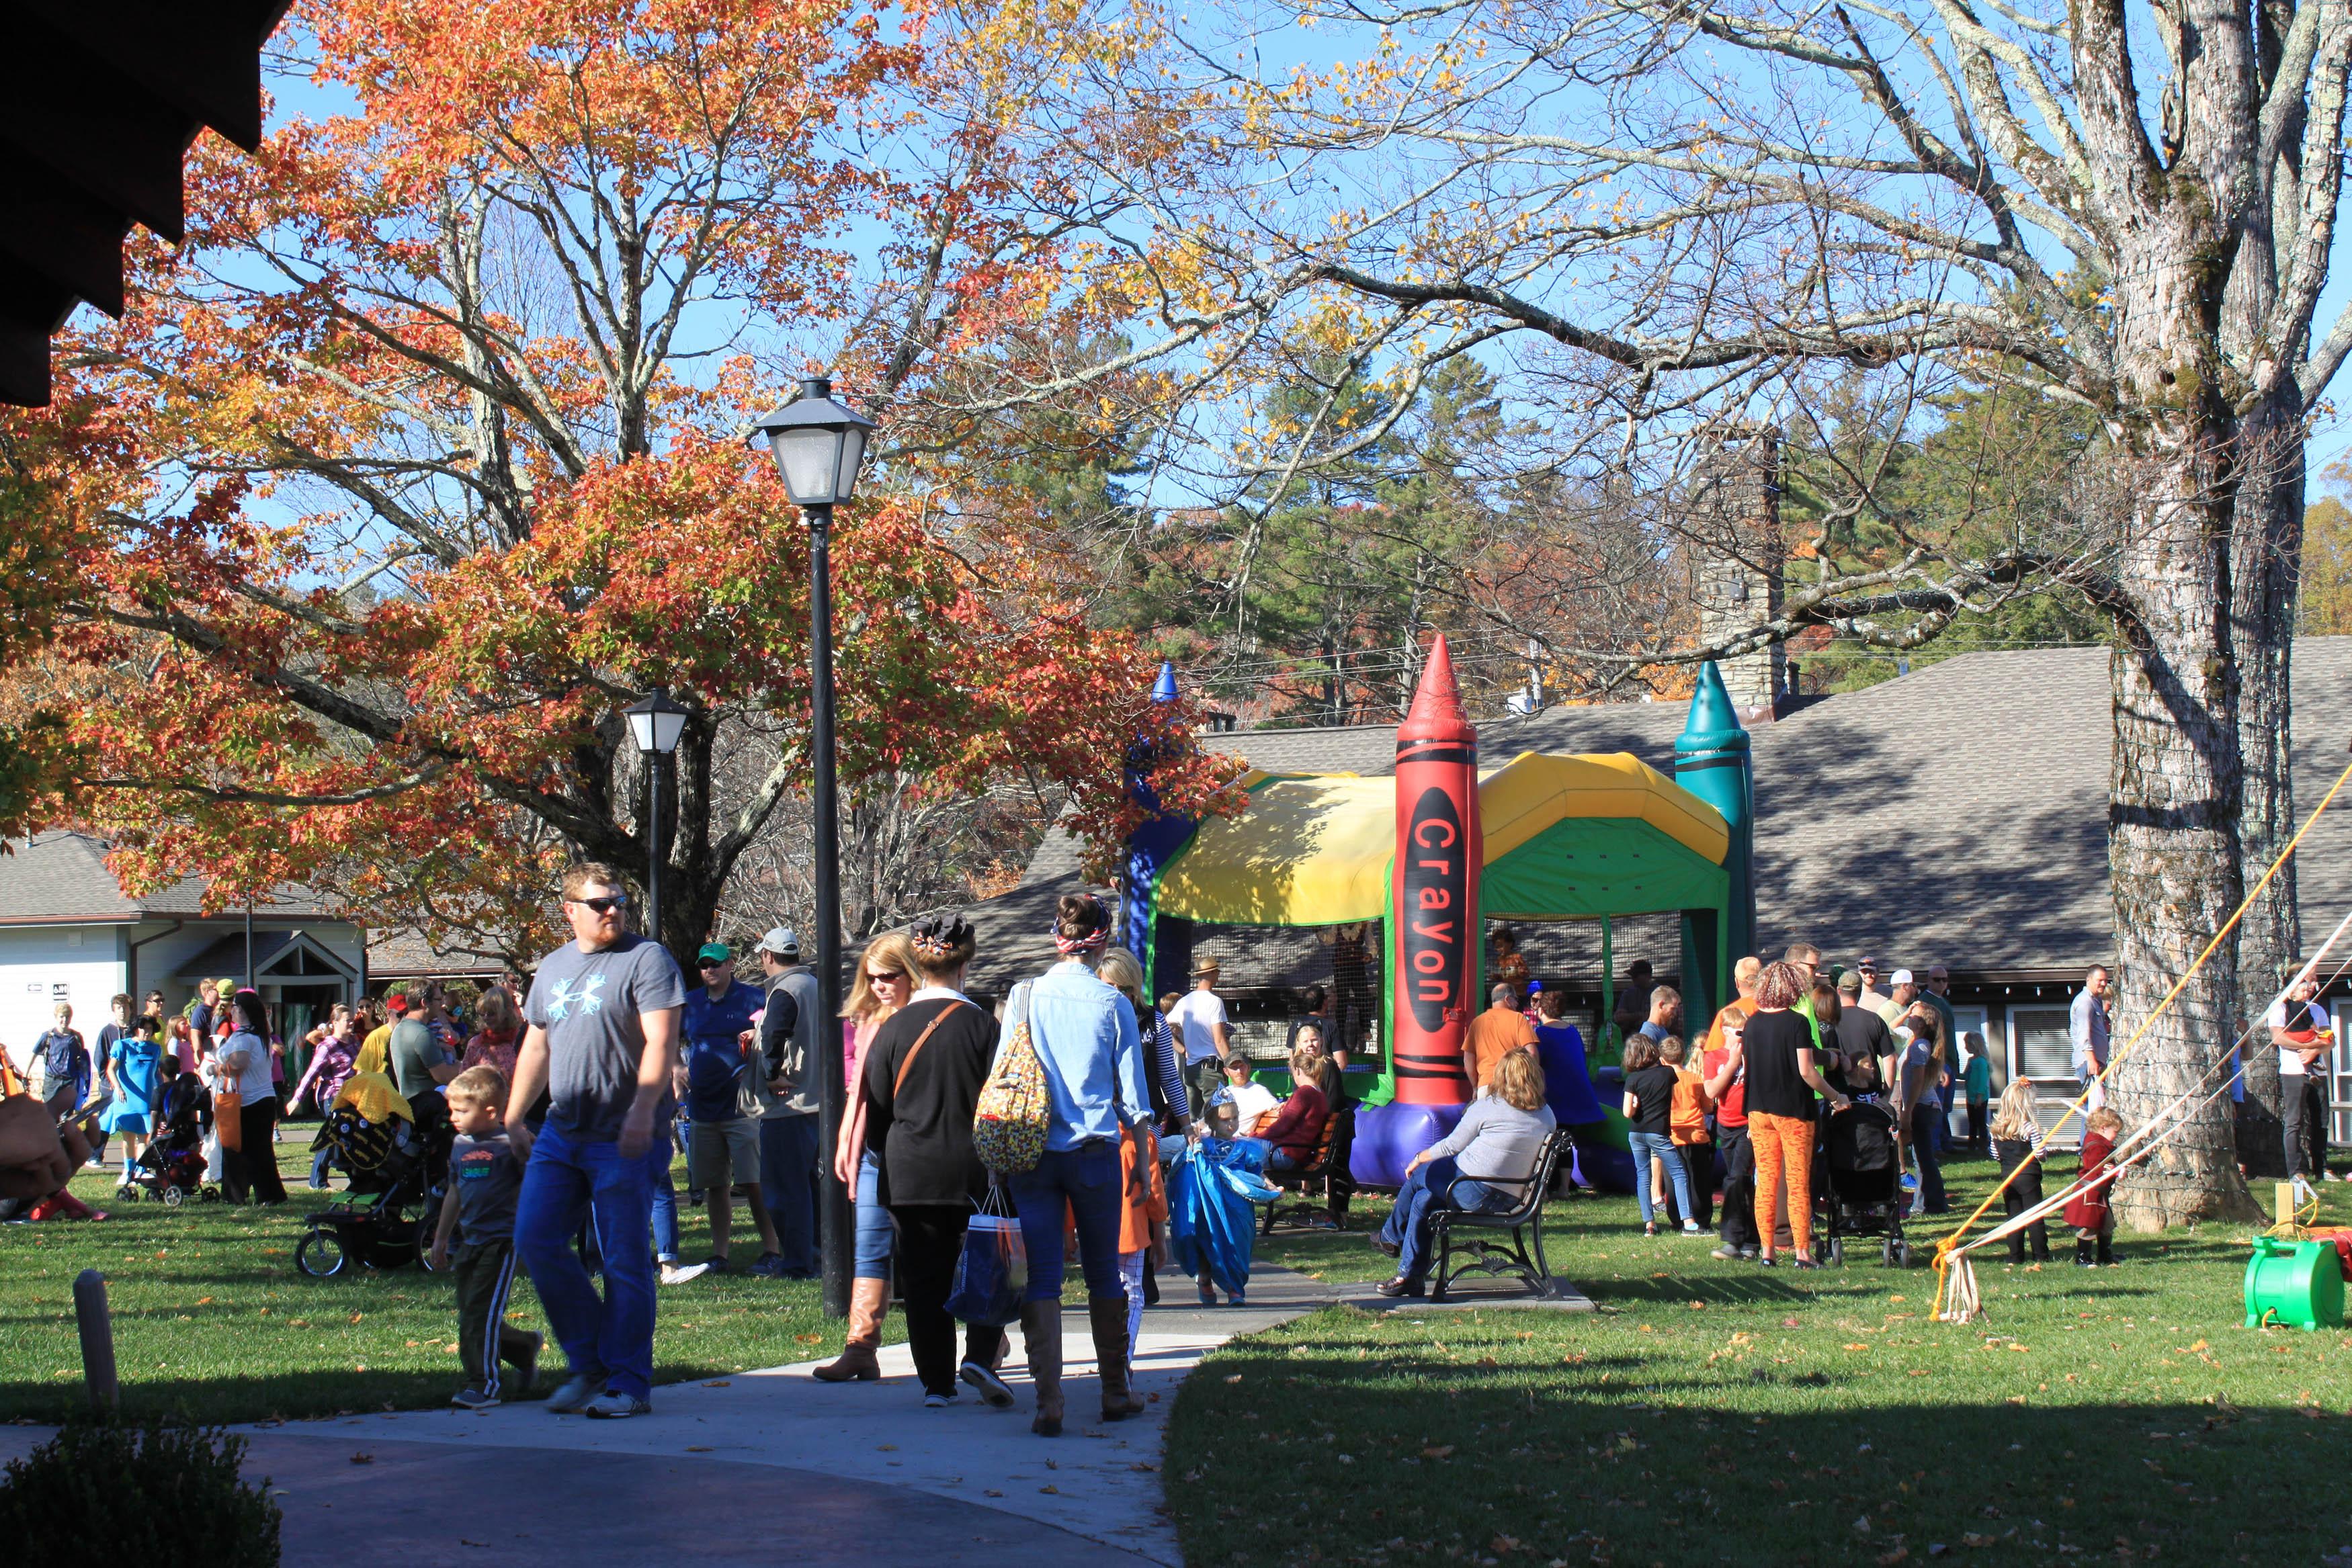 Halloween festival in Memorial Park in Blowing Rock NC